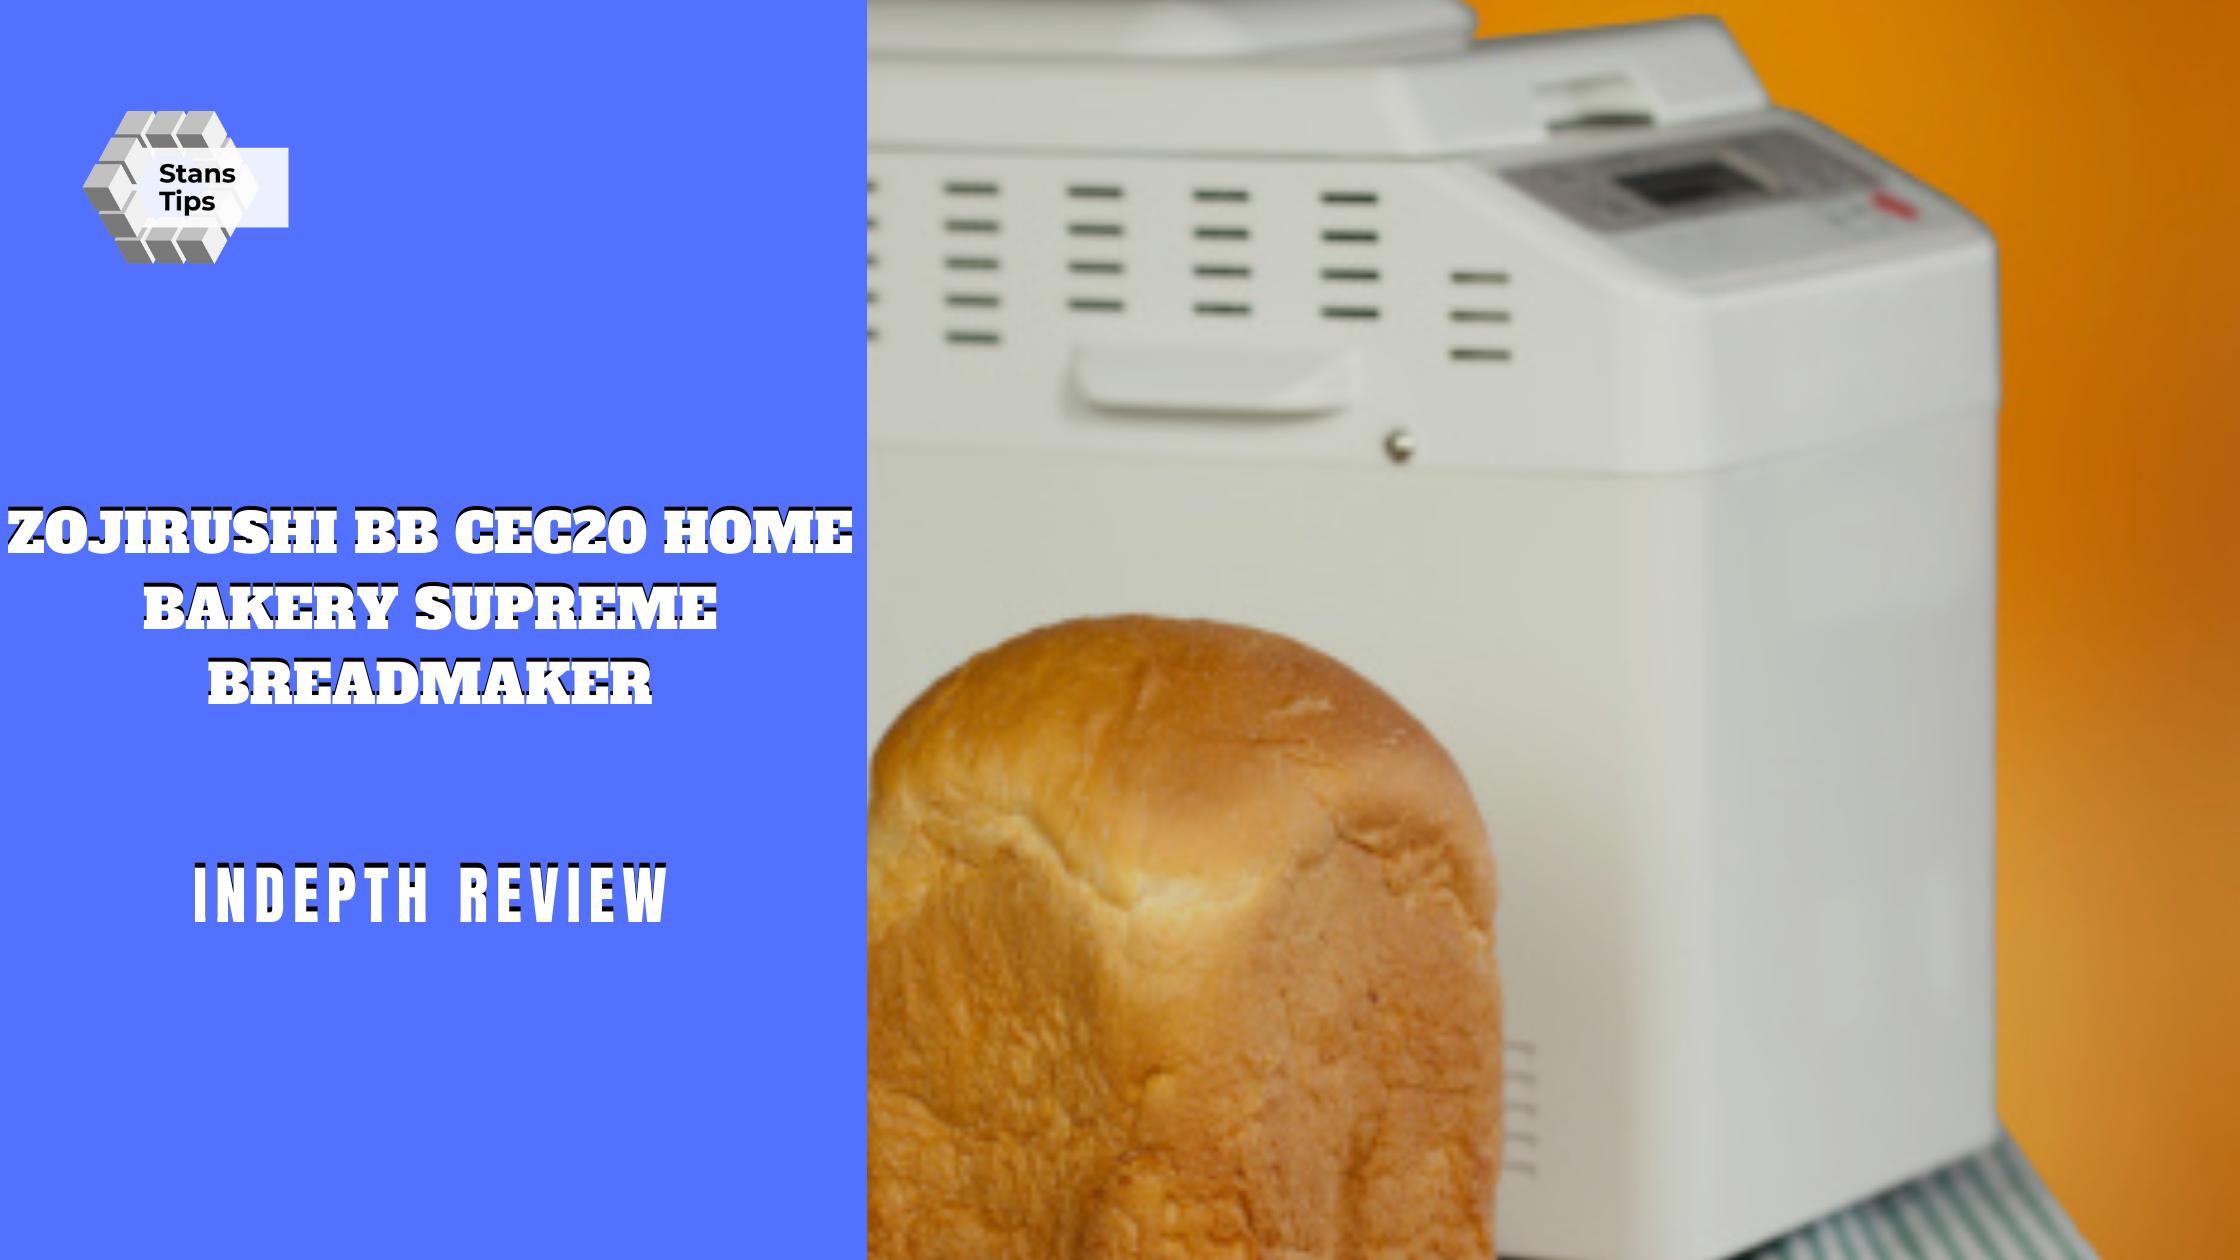 Zojirushi bb cec20 home bakery supreme breadmaker review